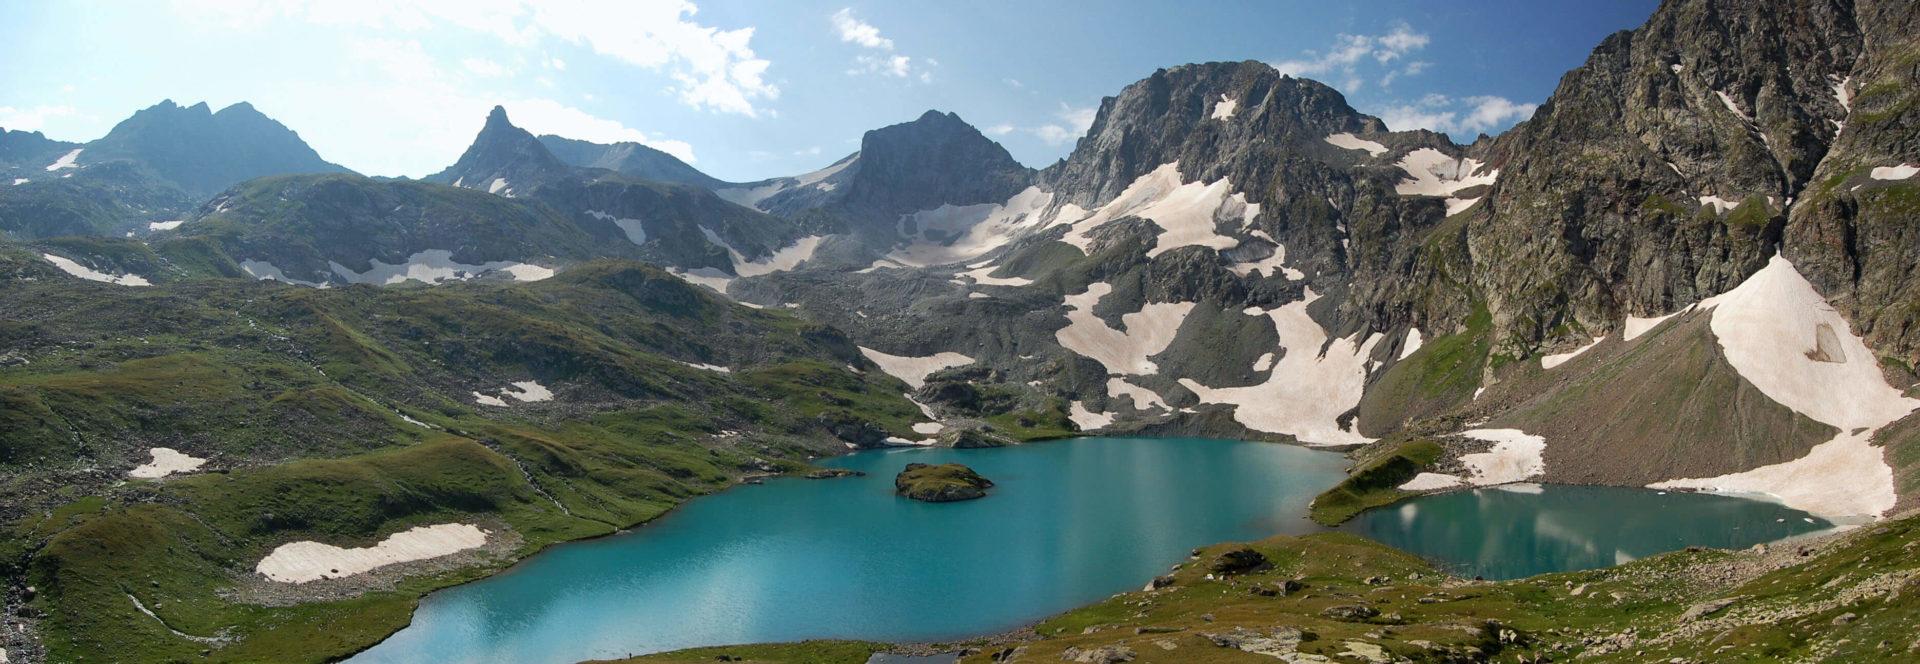 Поход к Имеретинским озерам